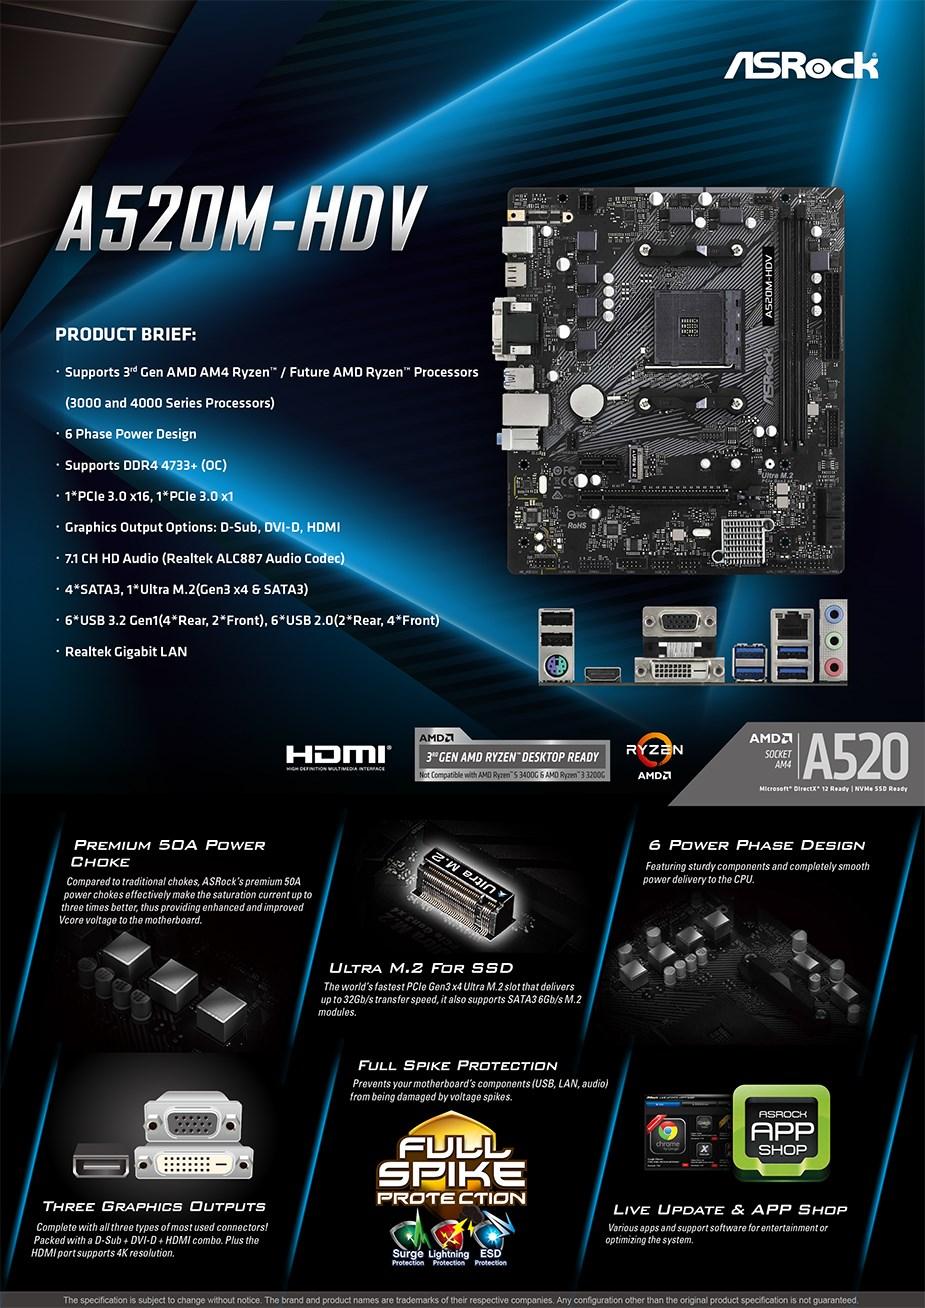 asrock-a520mhdv-am4-microatx-motherboard-ac37319-6.jpg